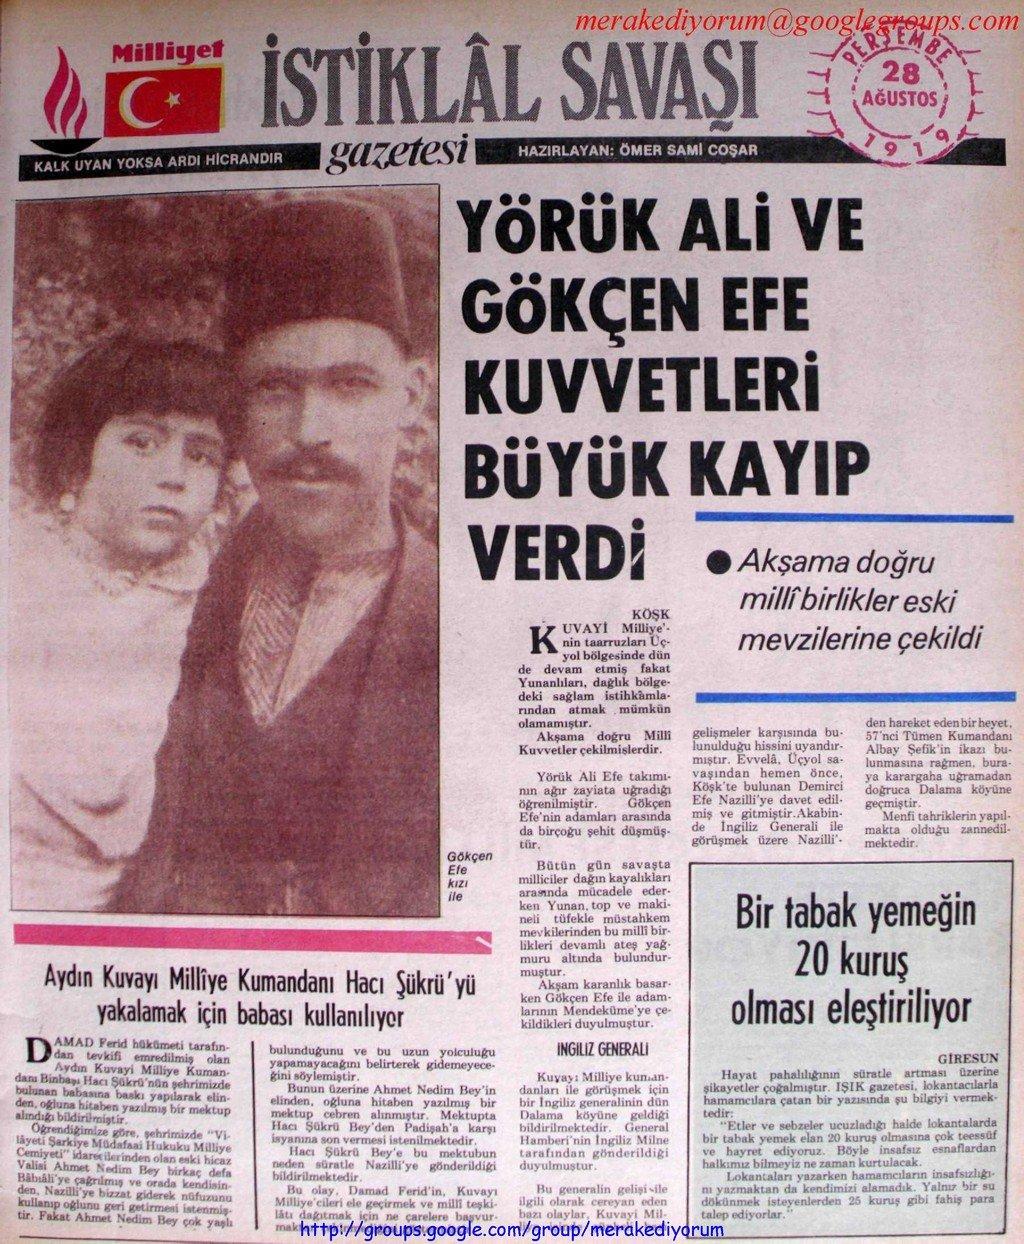 istiklal savaşı gazetesi - 28 ağustos 1919